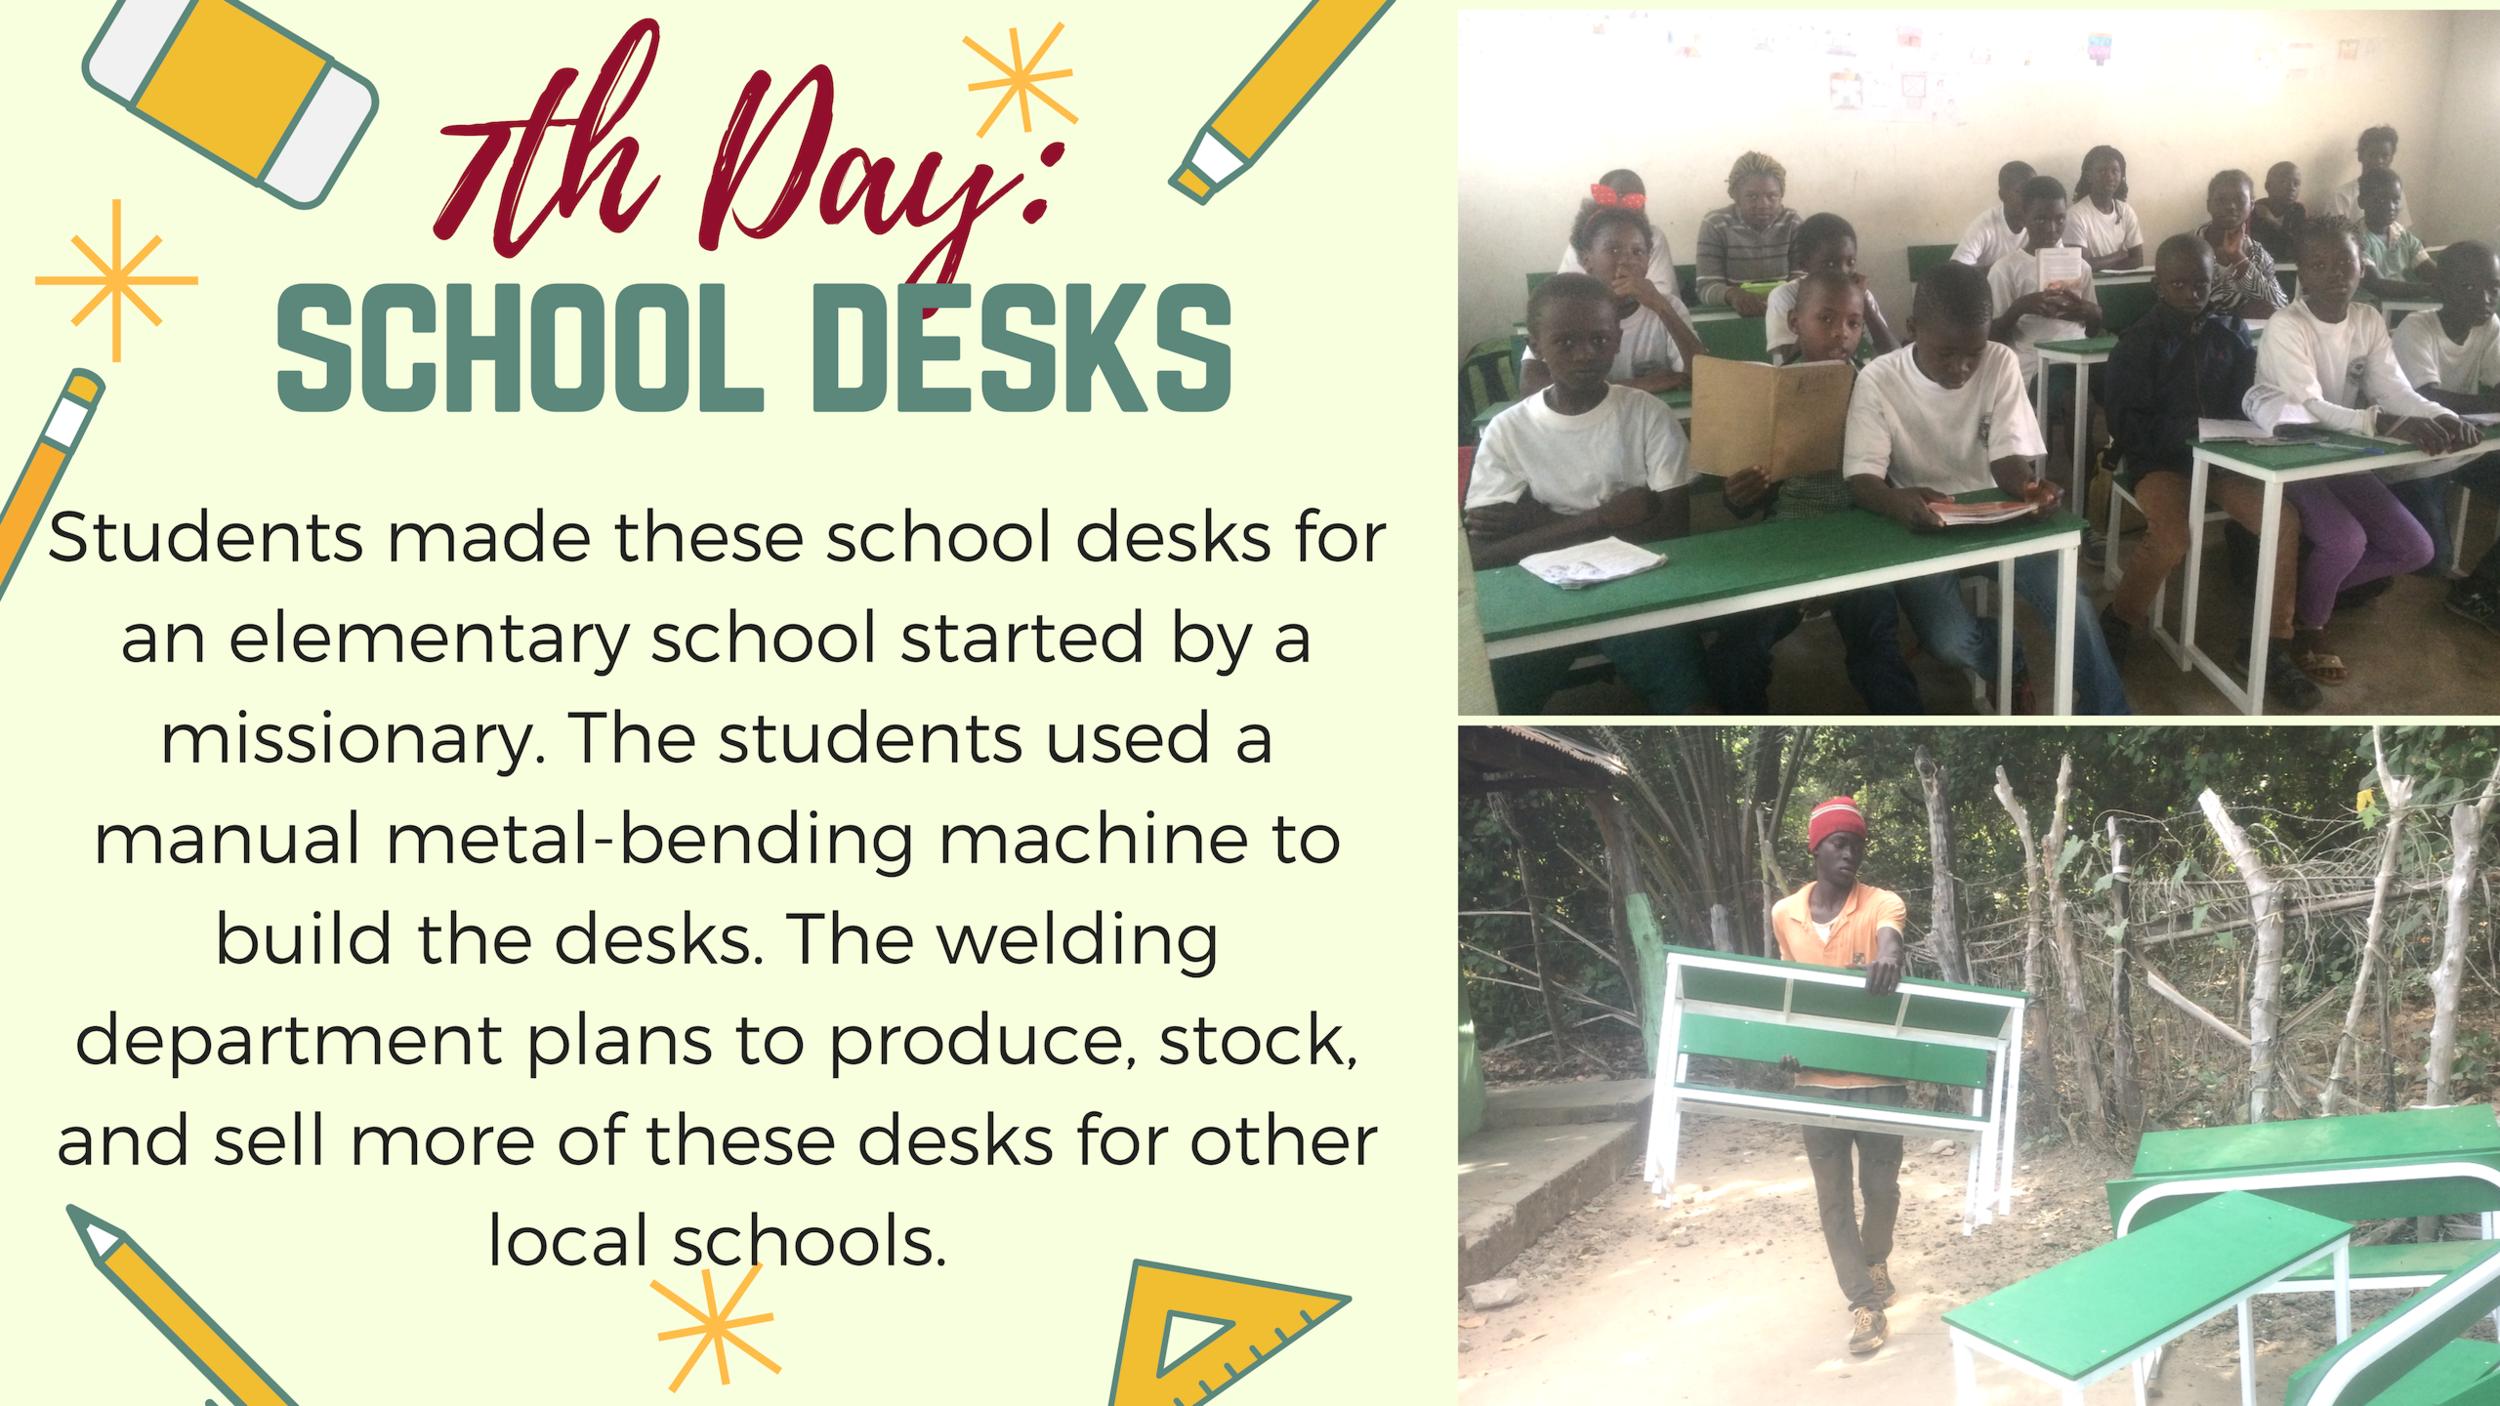 7th day school desks.png